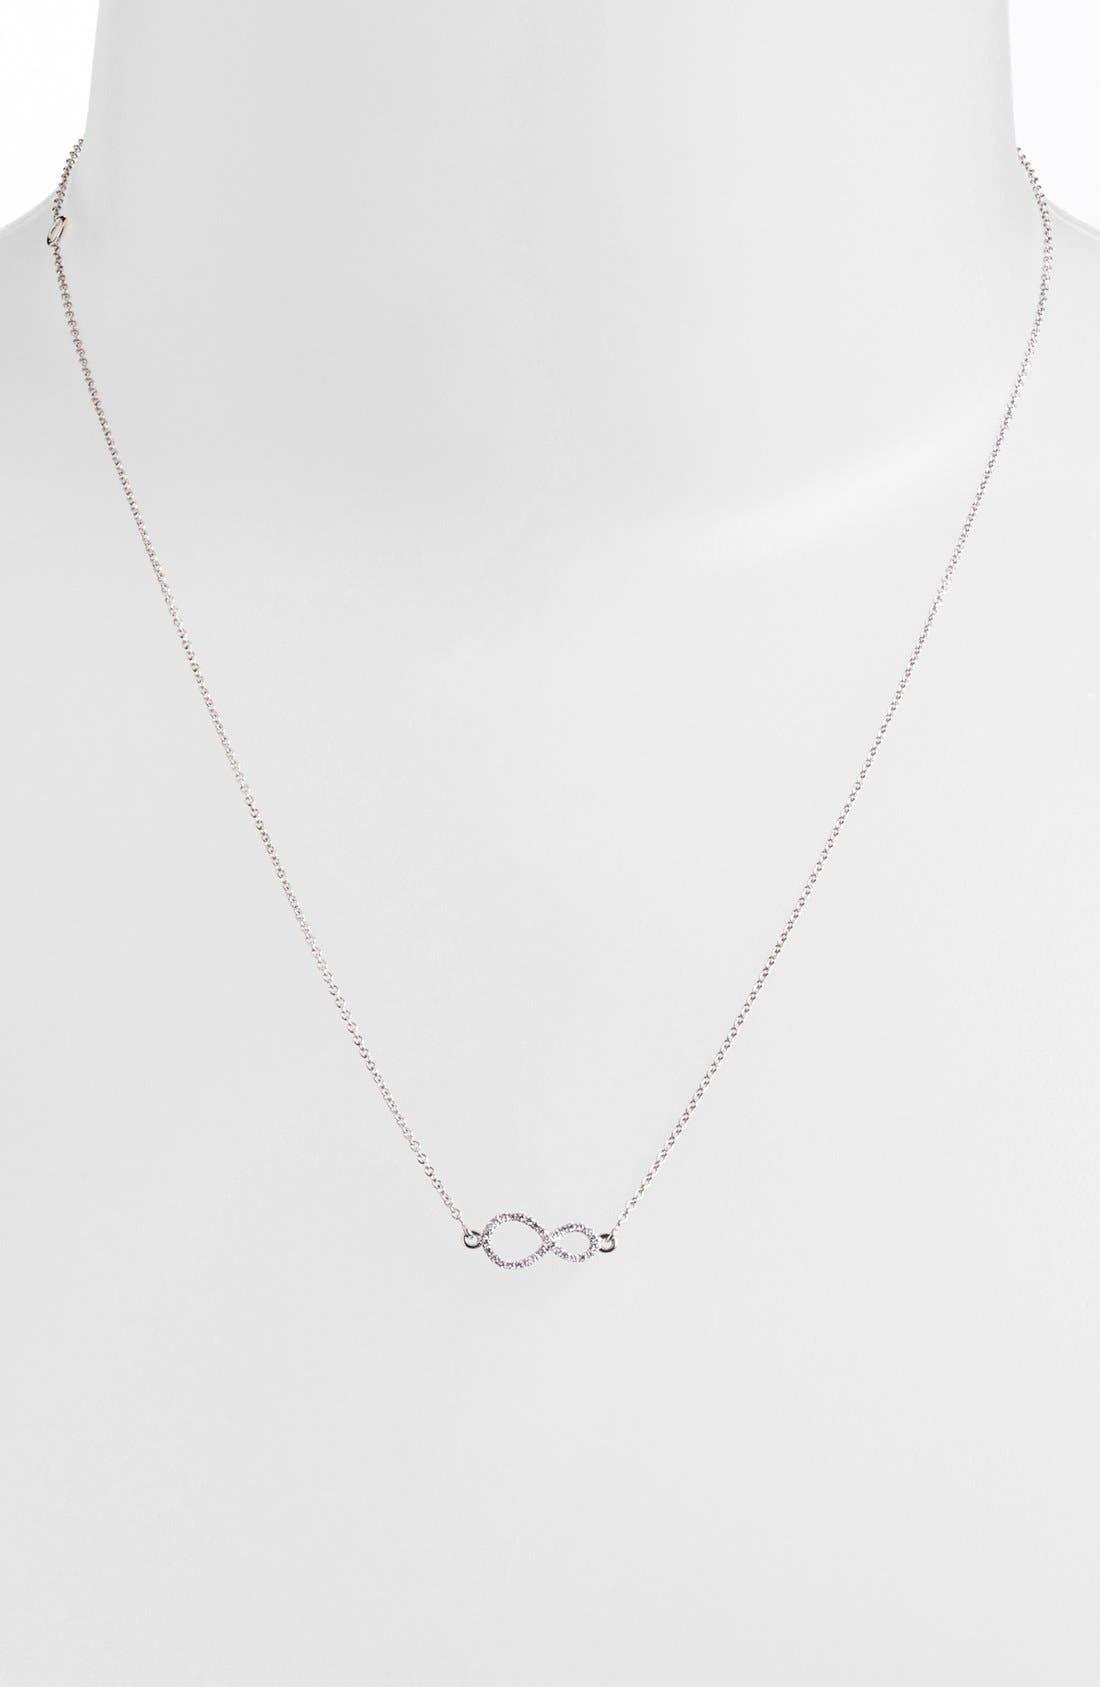 Pavé Diamond Sideways Infinity Symbol Pendant Necklace,                             Alternate thumbnail 2, color,                             710